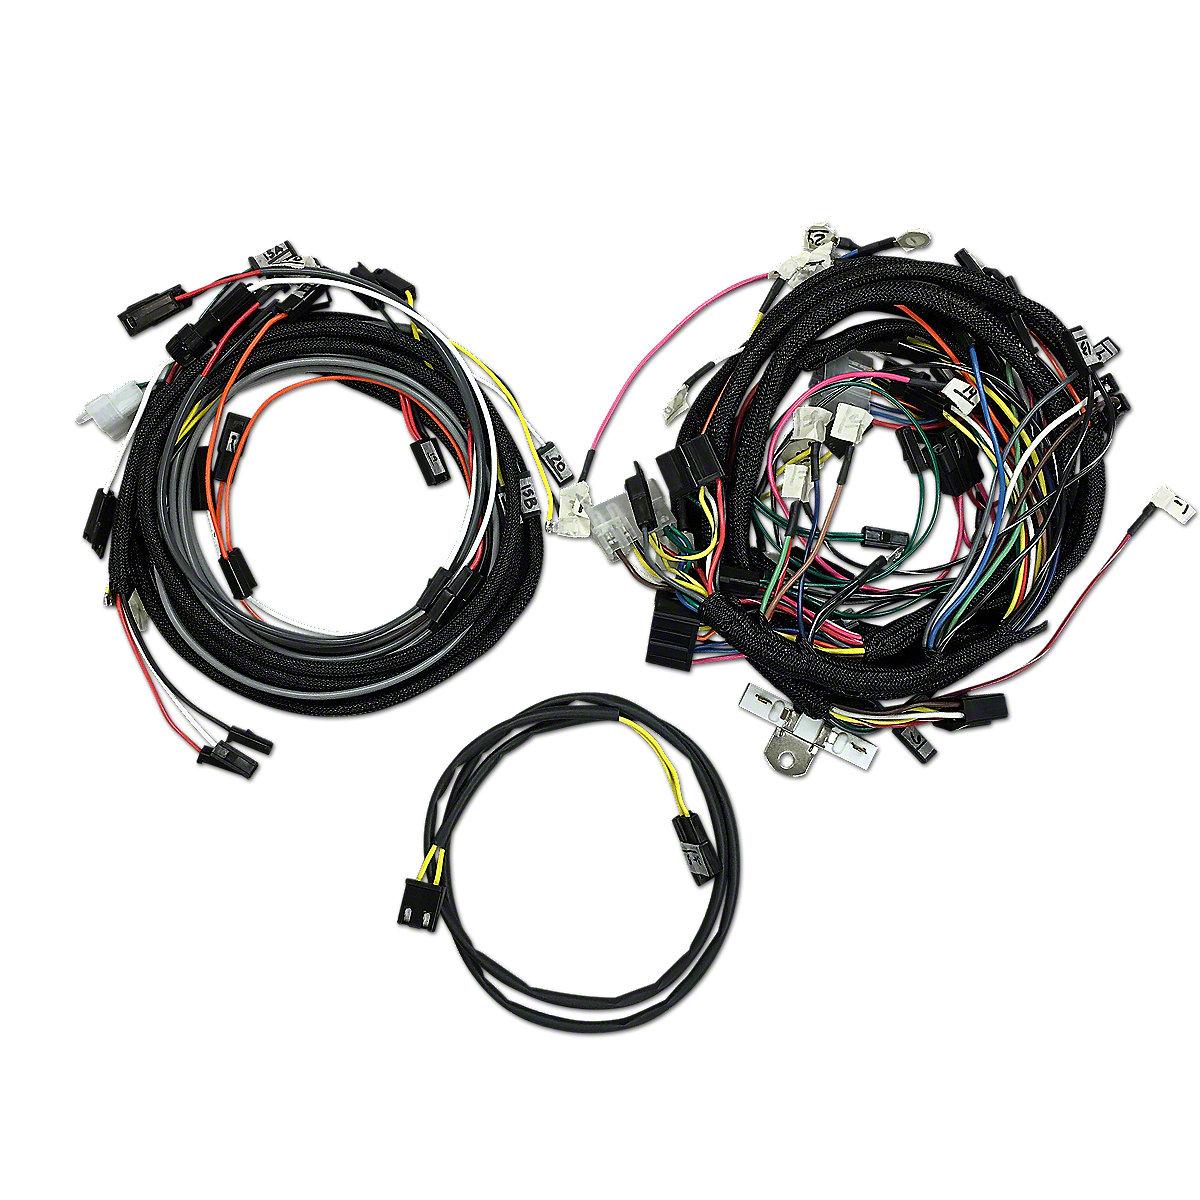 Yamaha Ysr50 Wiring Diagram : Yamaha ysr wiring diagram xt